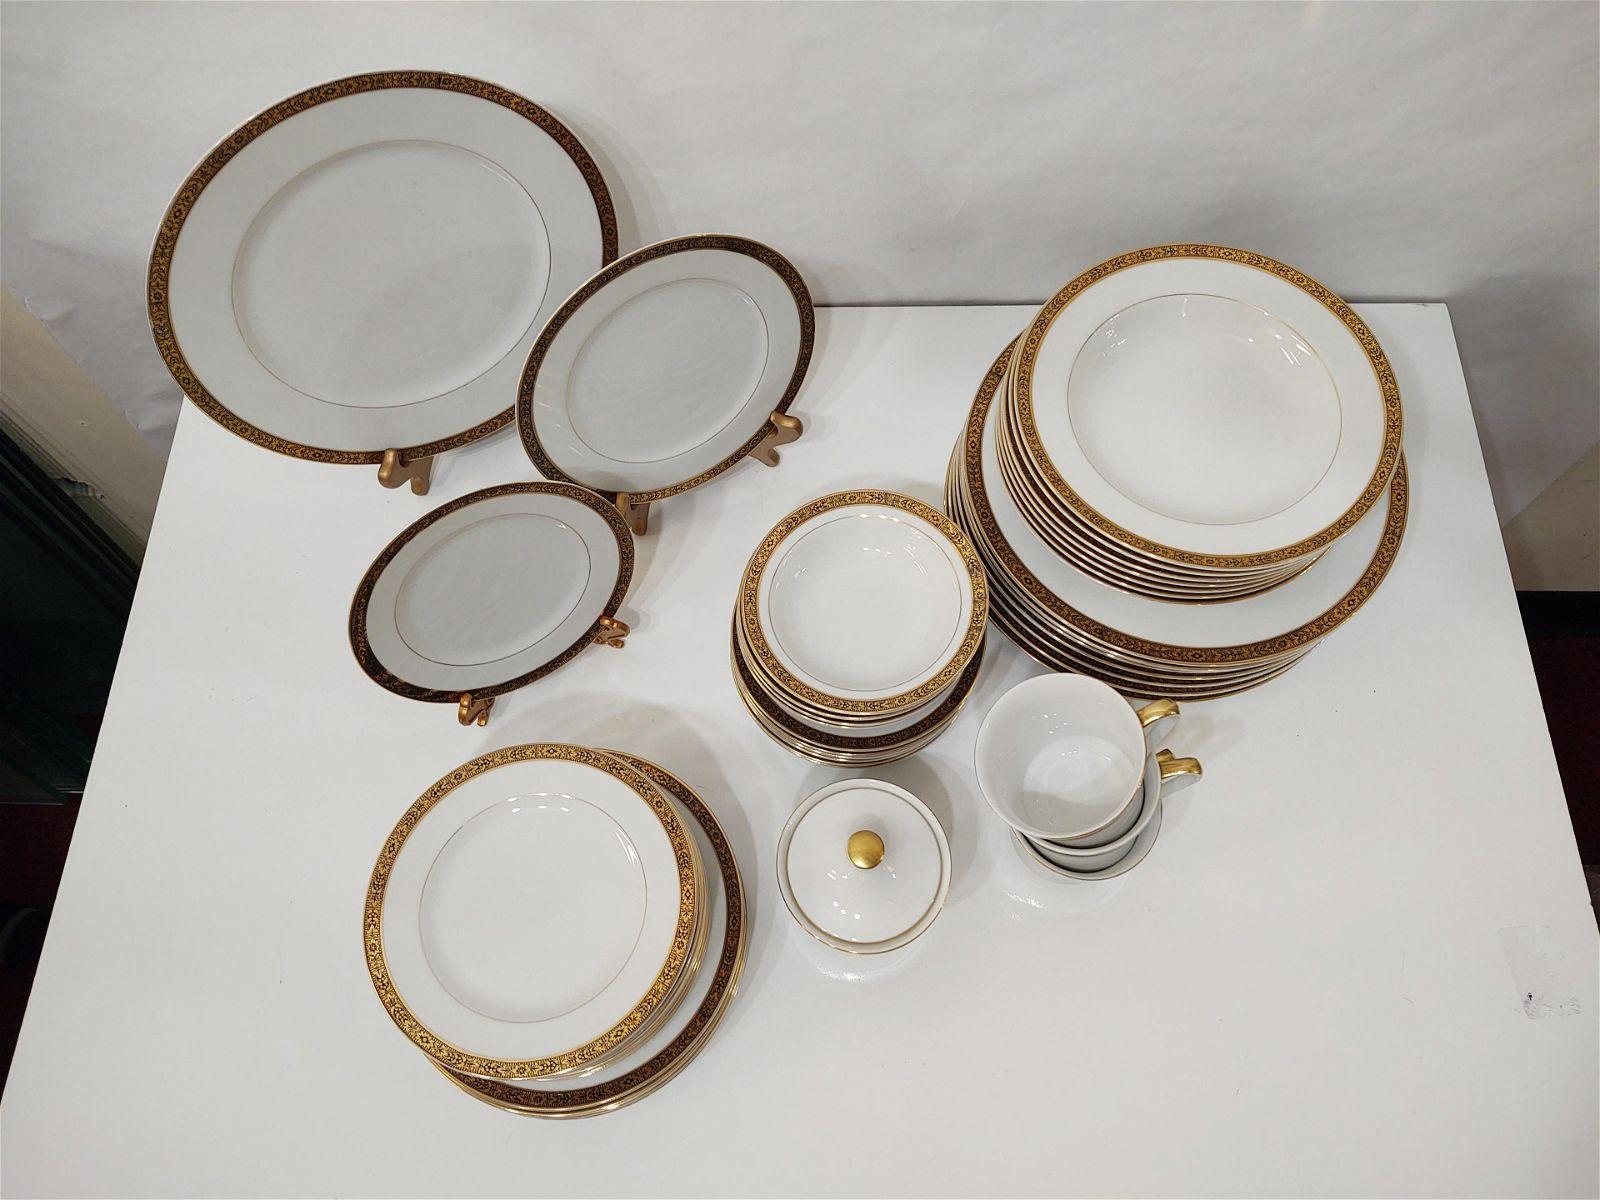 45 Pc Wyndham Fine China Dinnerware